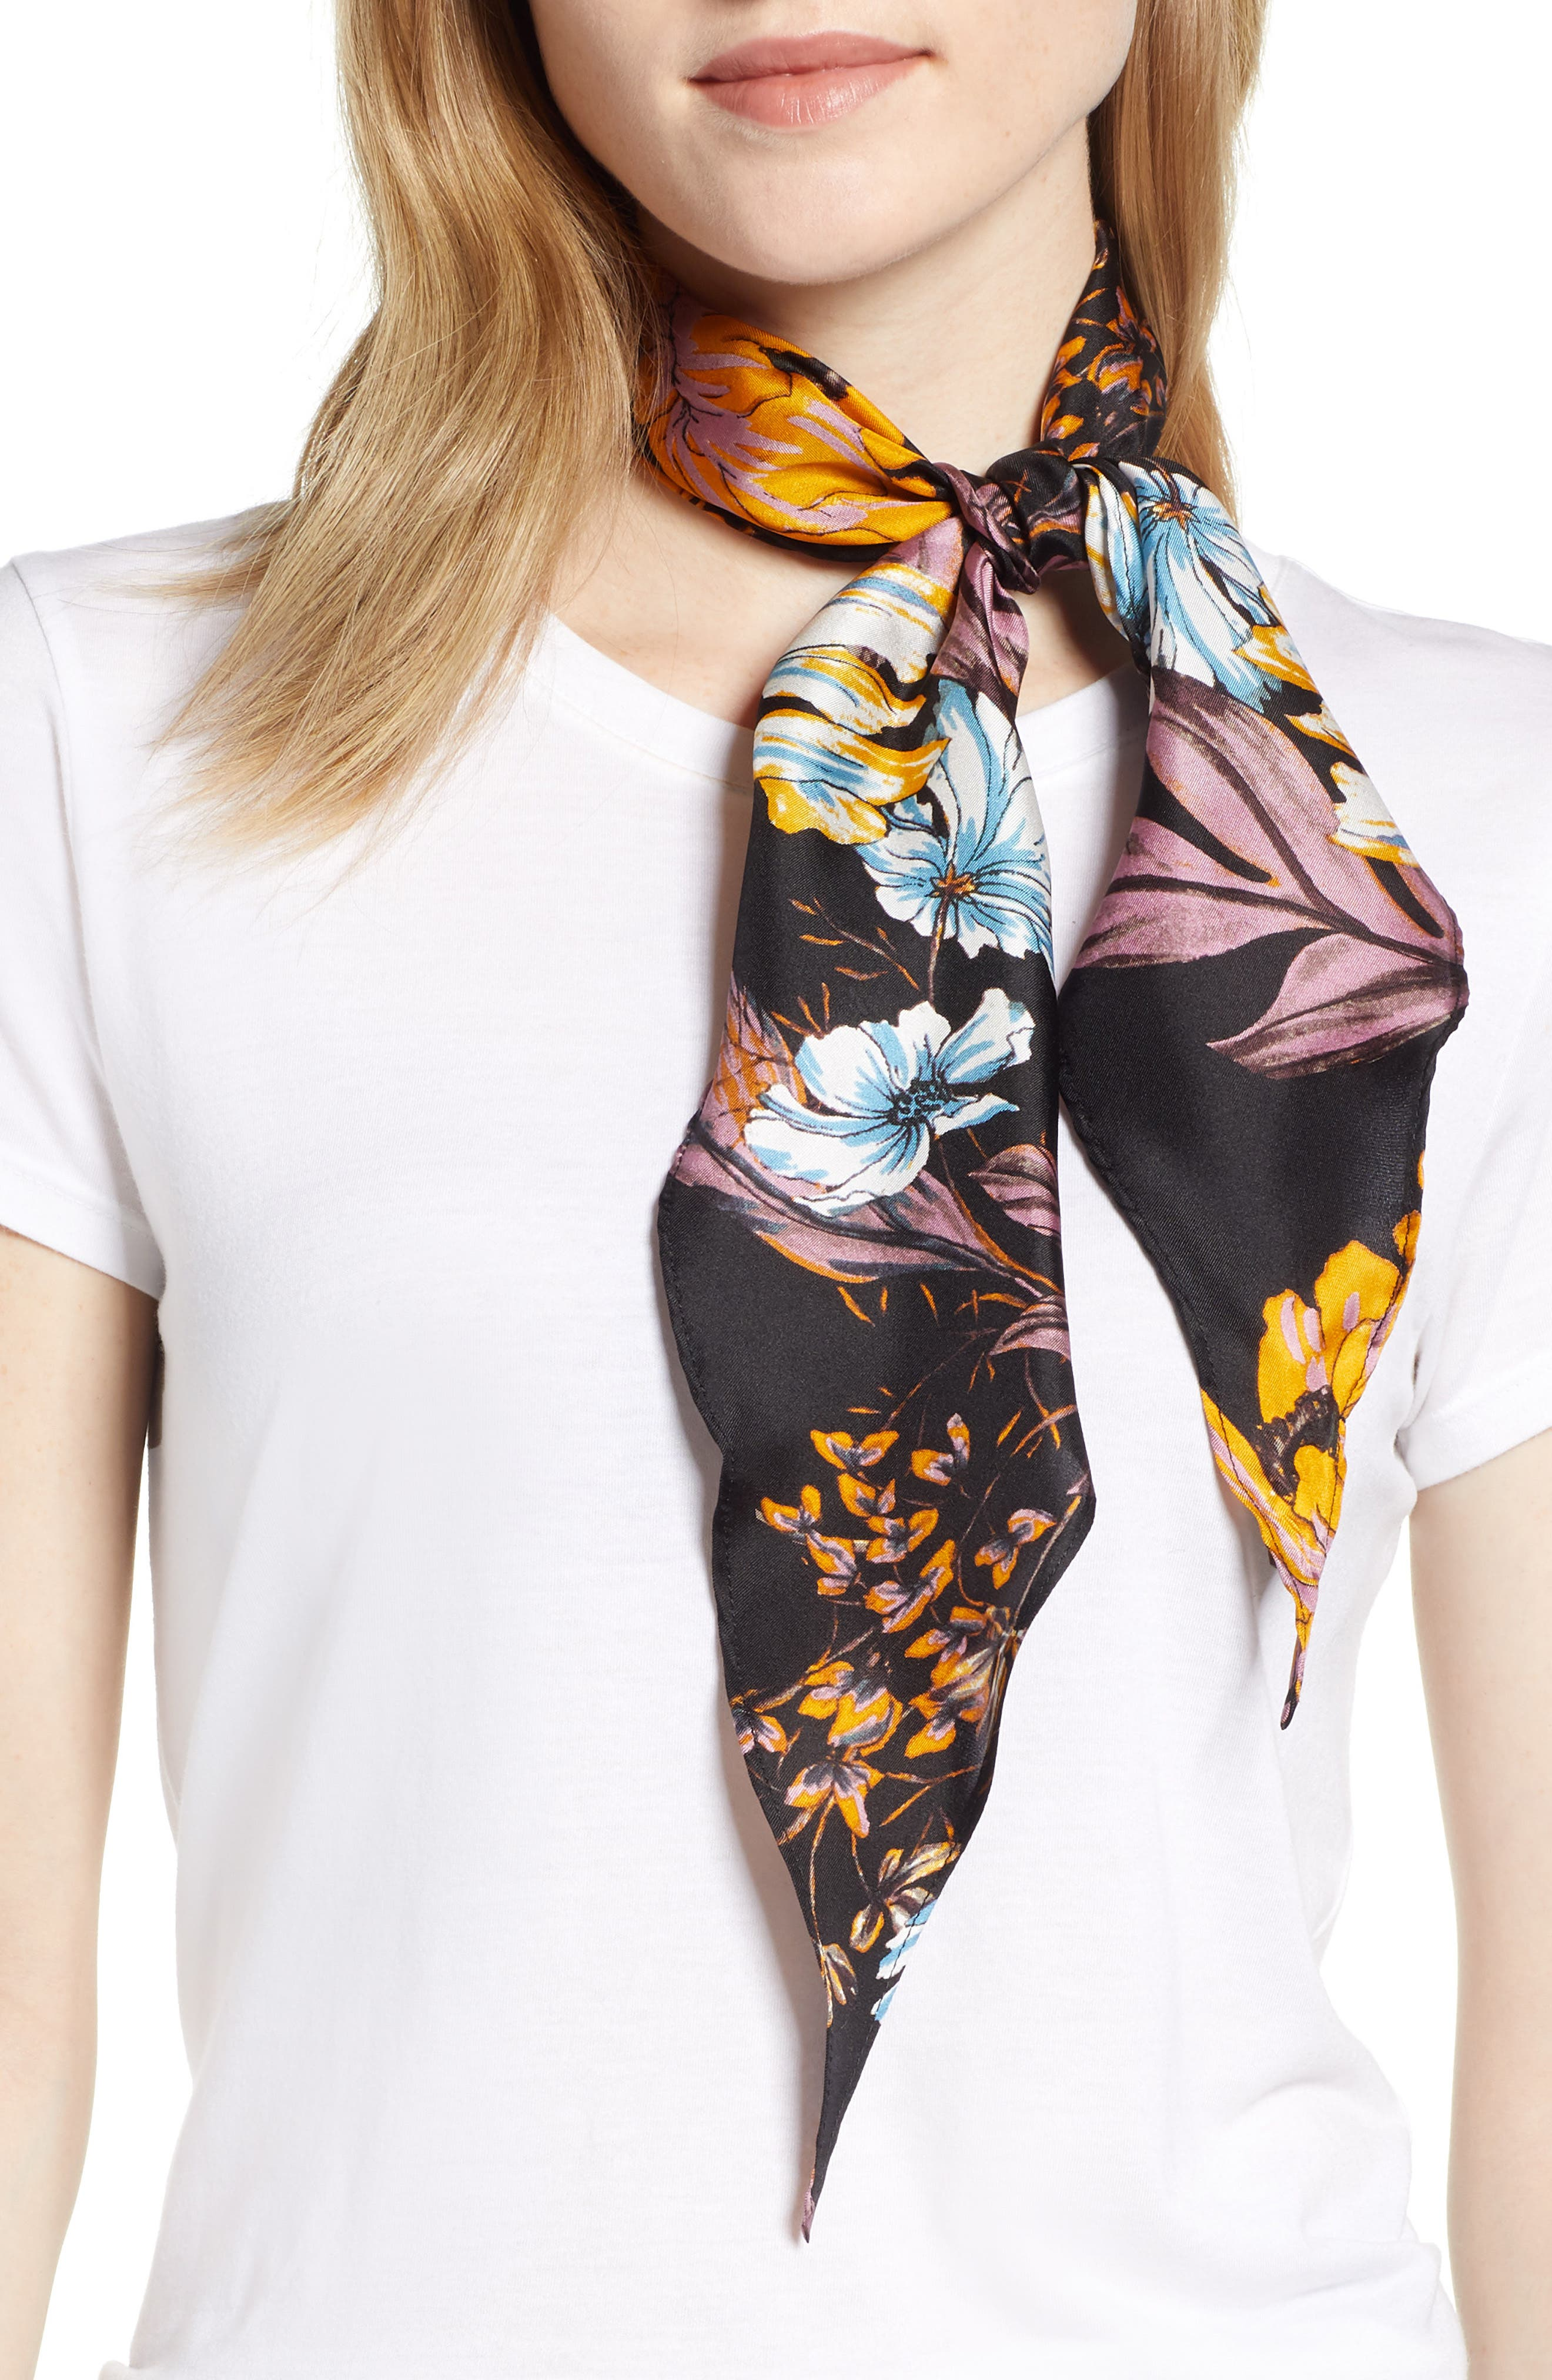 Floral Print Silk Kite Scarf,                             Main thumbnail 1, color,                             BLACK DARK FLORAL